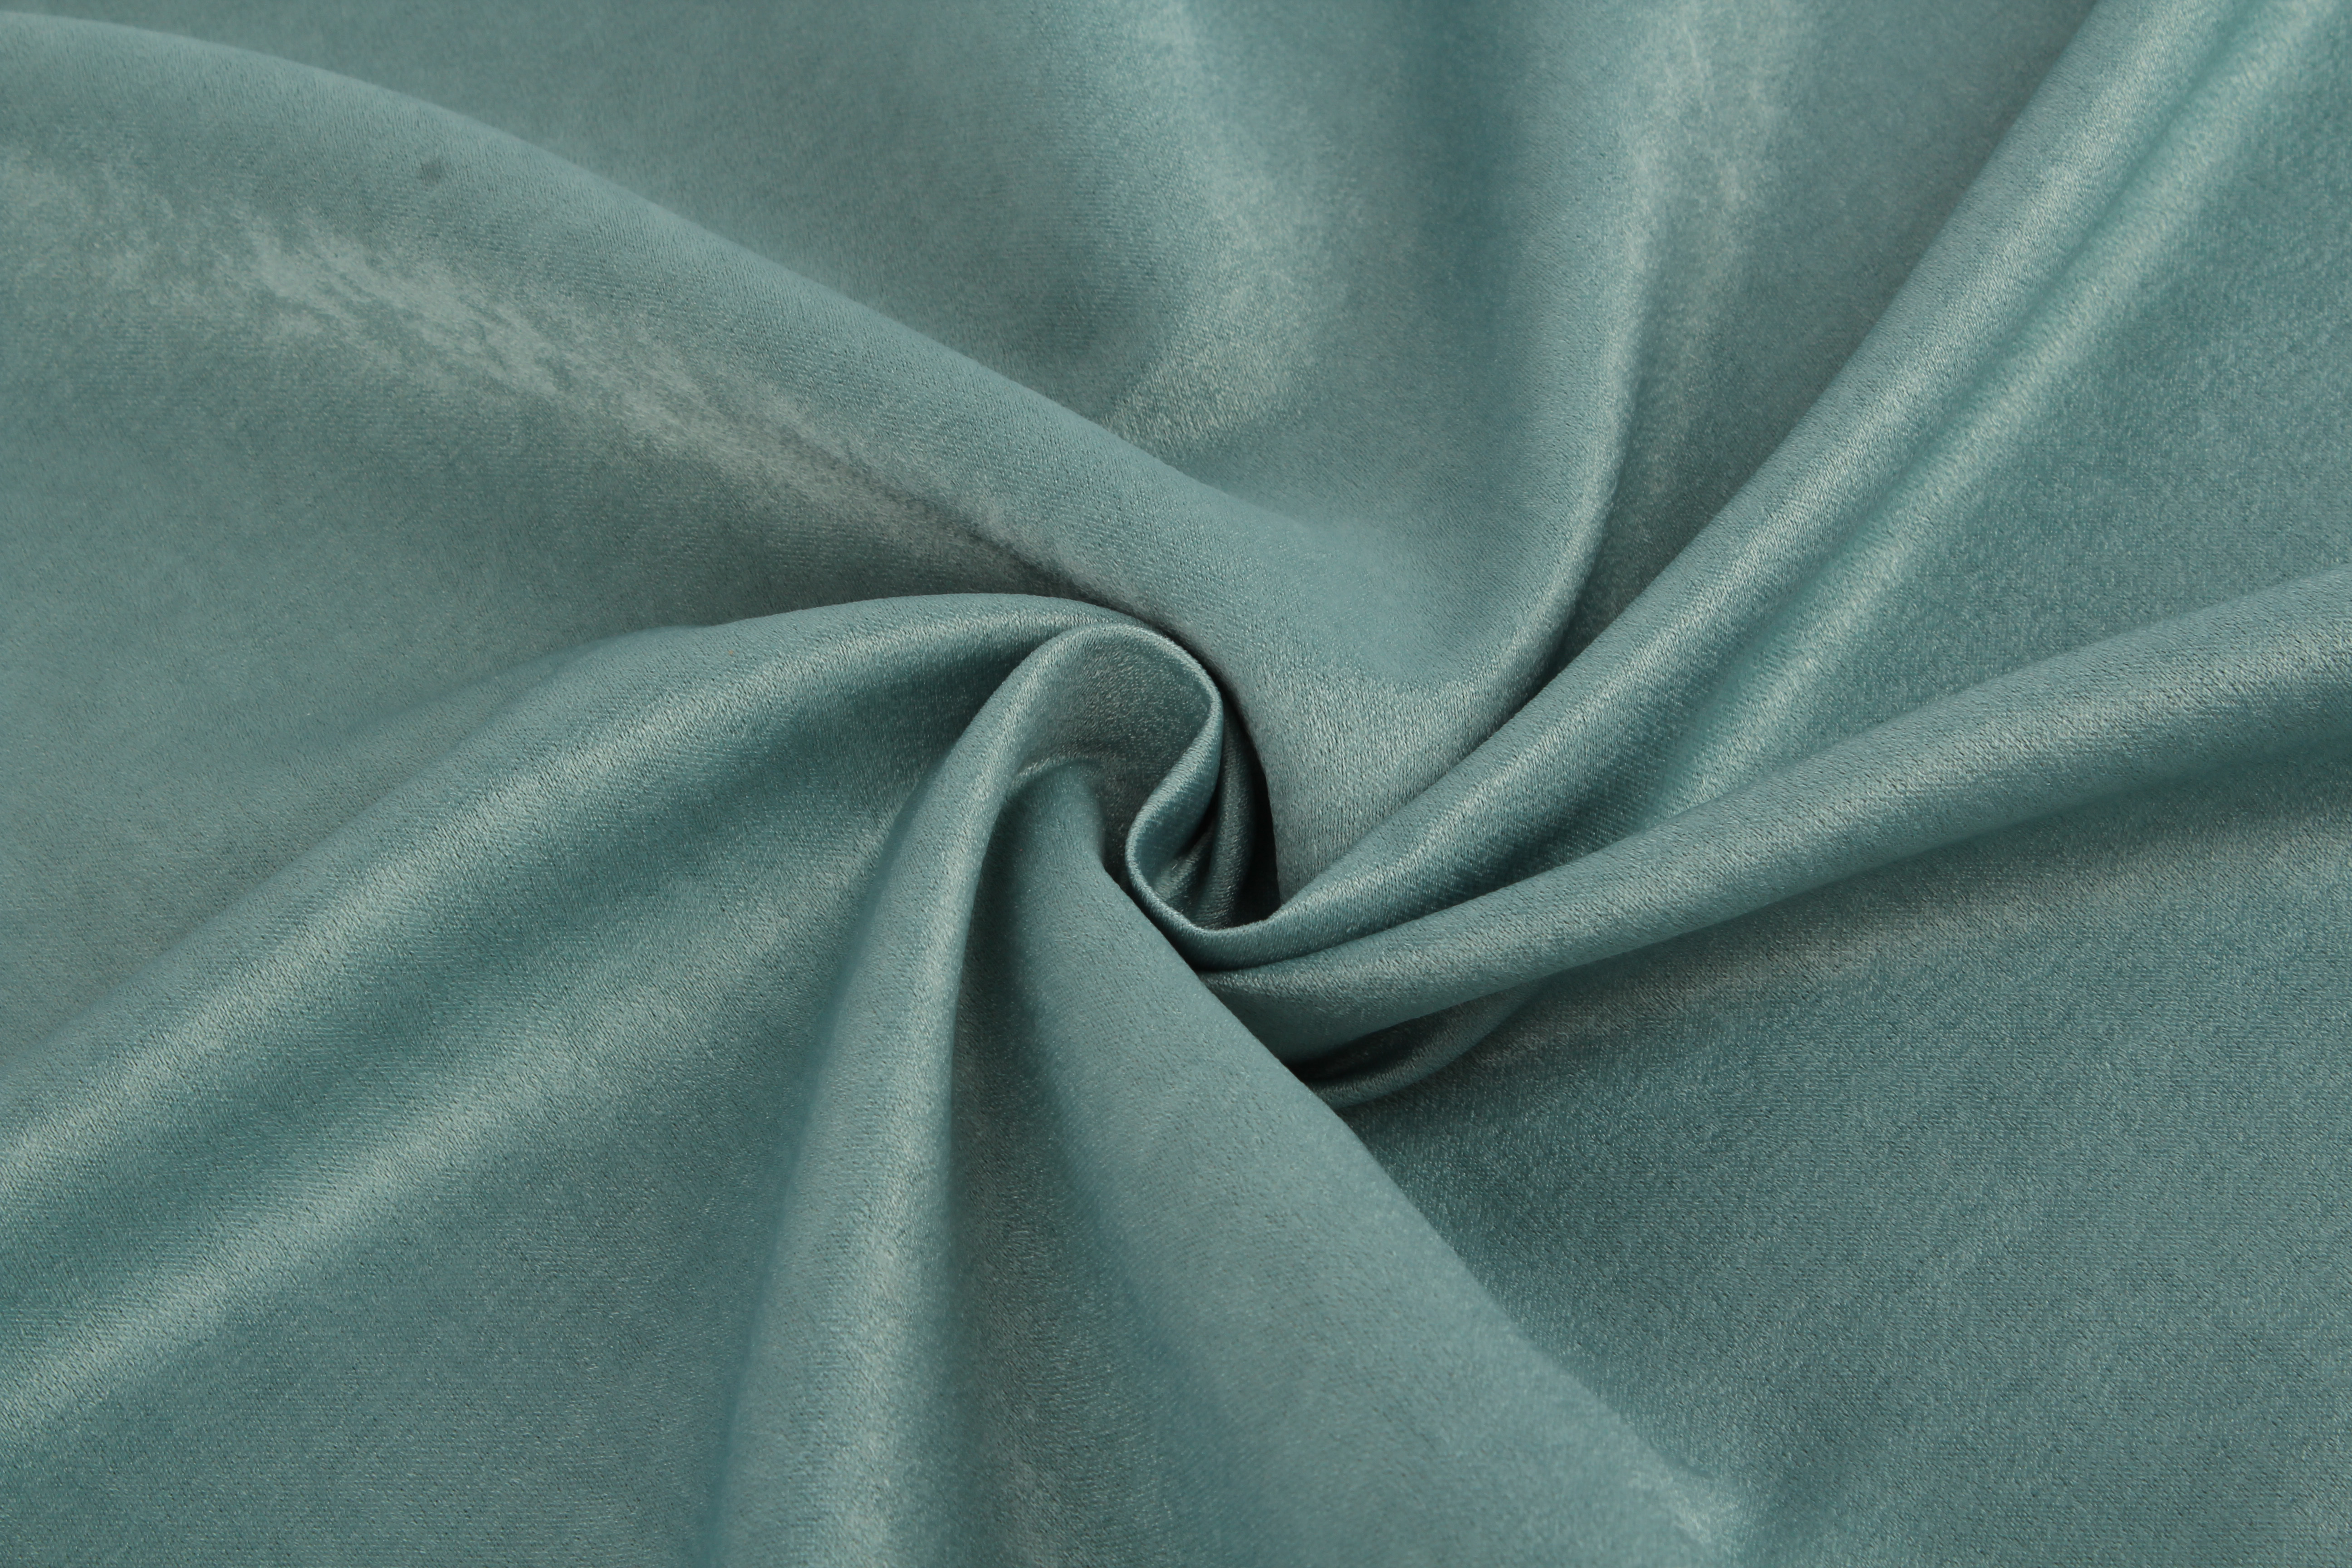 {} TexRepublic Материал Портьерная ткань Palette Цвет: Ментоловый texrepublic материал портьерная ткань palette цвет брусничный